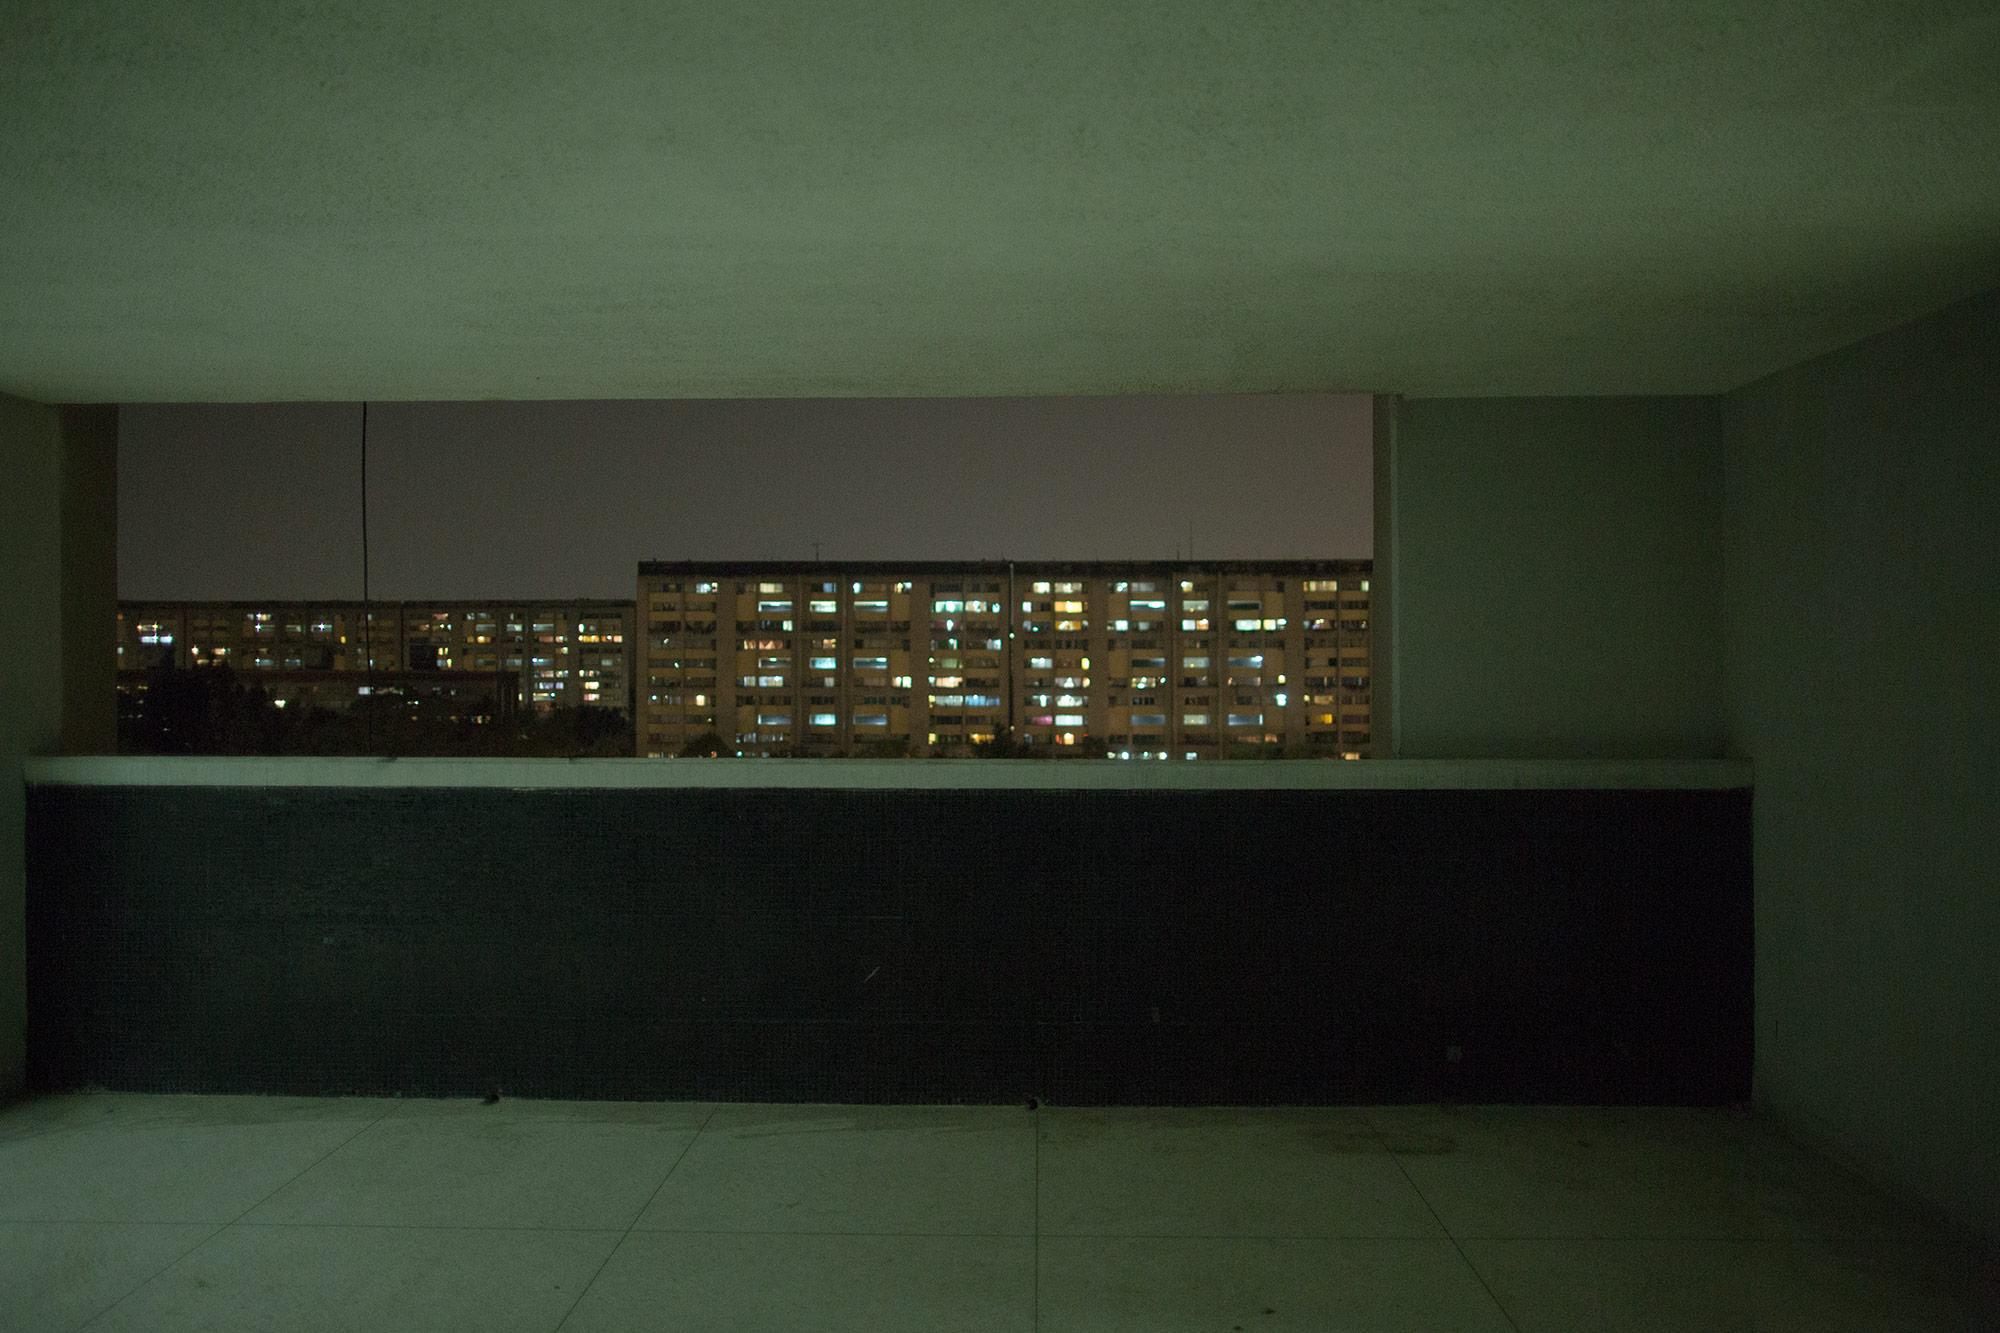 bombay-film-03.jpg